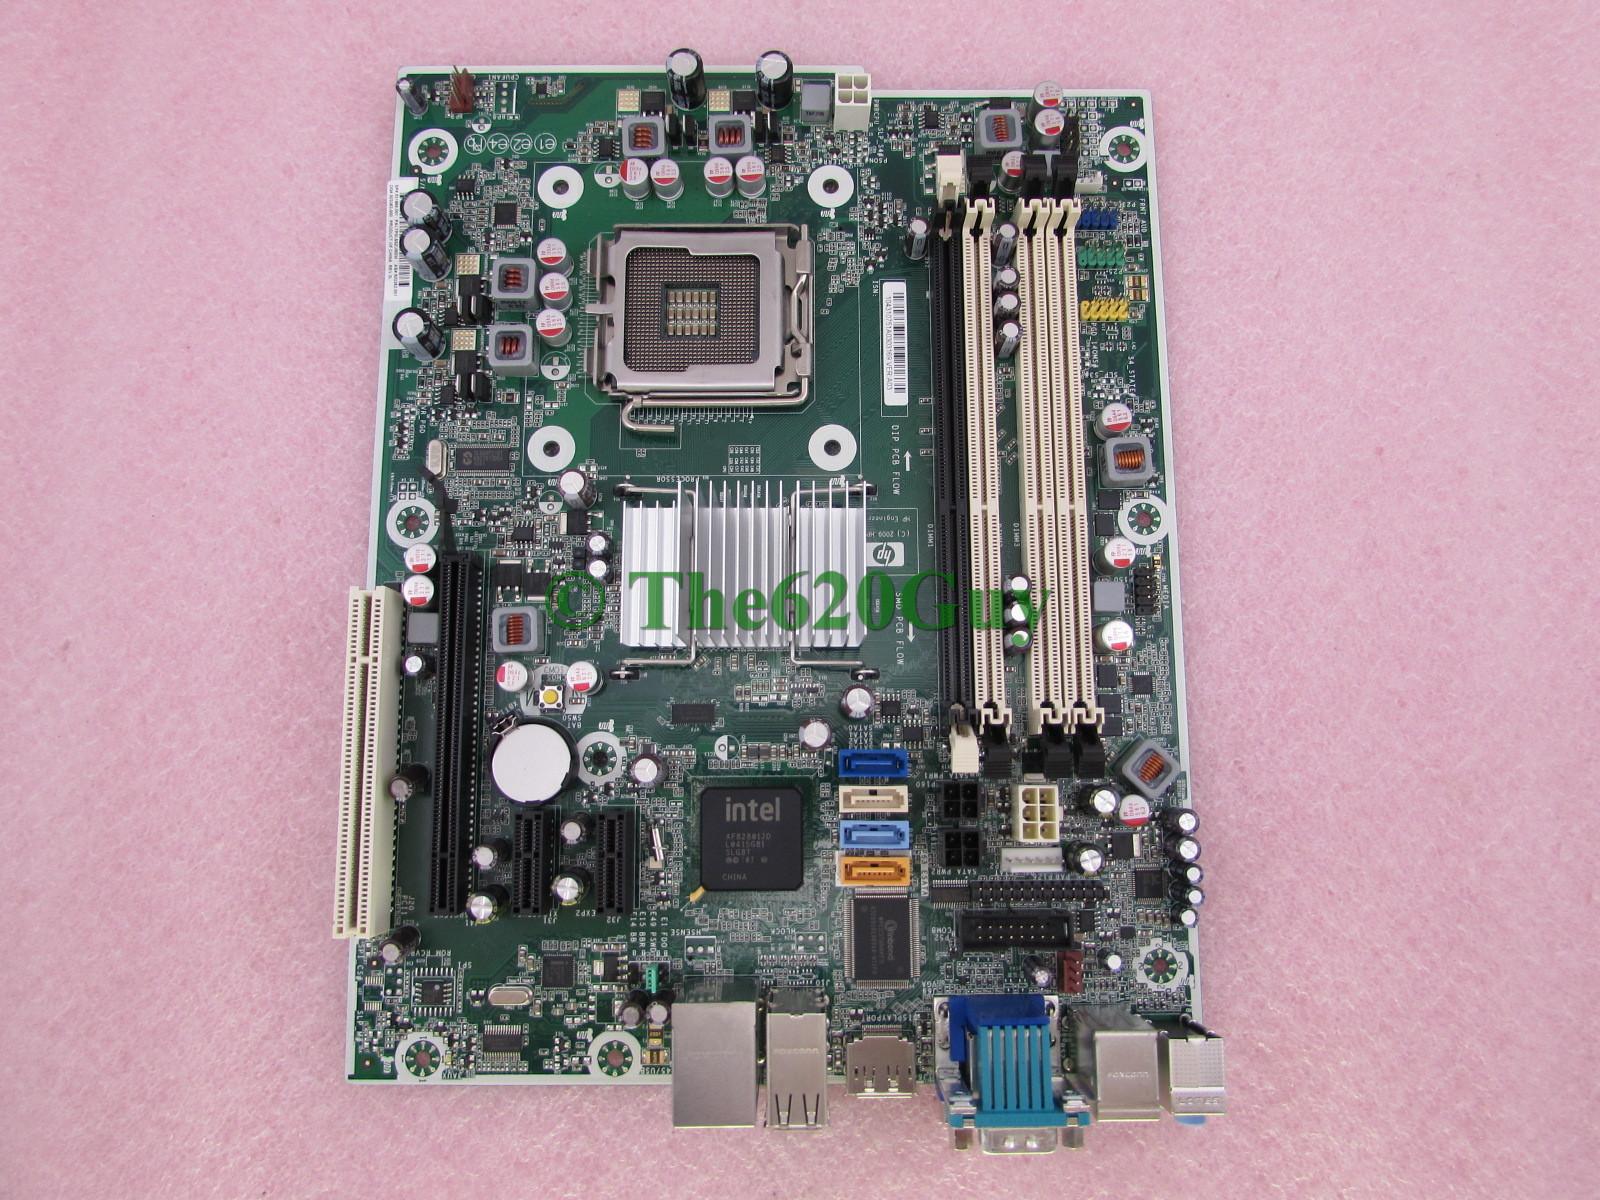 Compaq 6000 Pro Drivers Xp // vertimoper ml